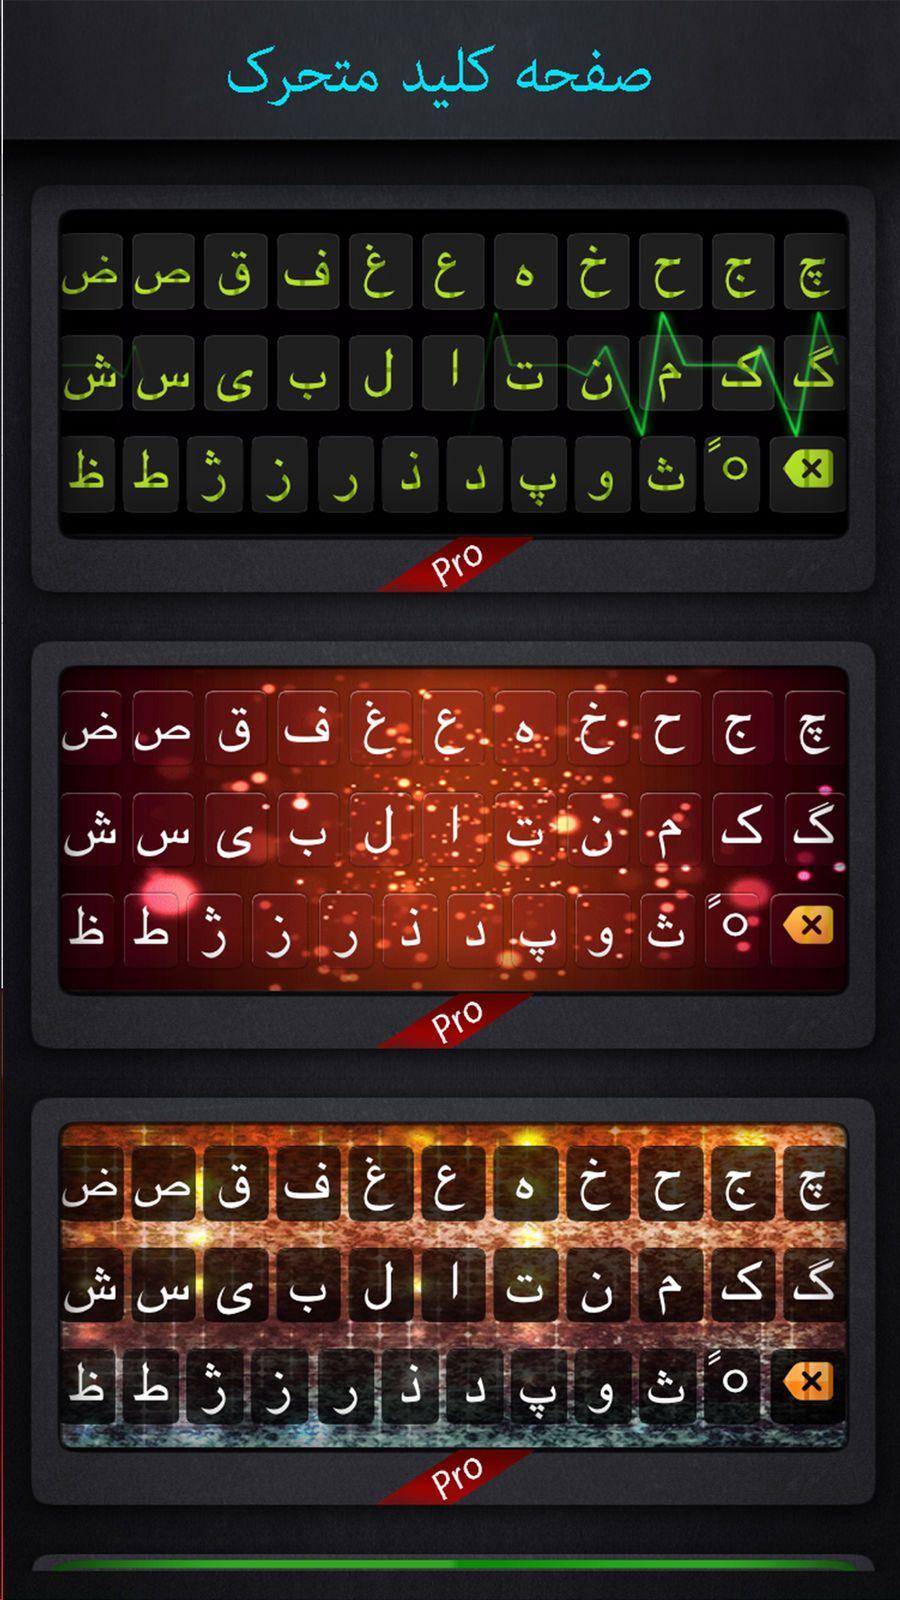 FarsiBoard Persian Keyboard ProductivityUtilitiesapps